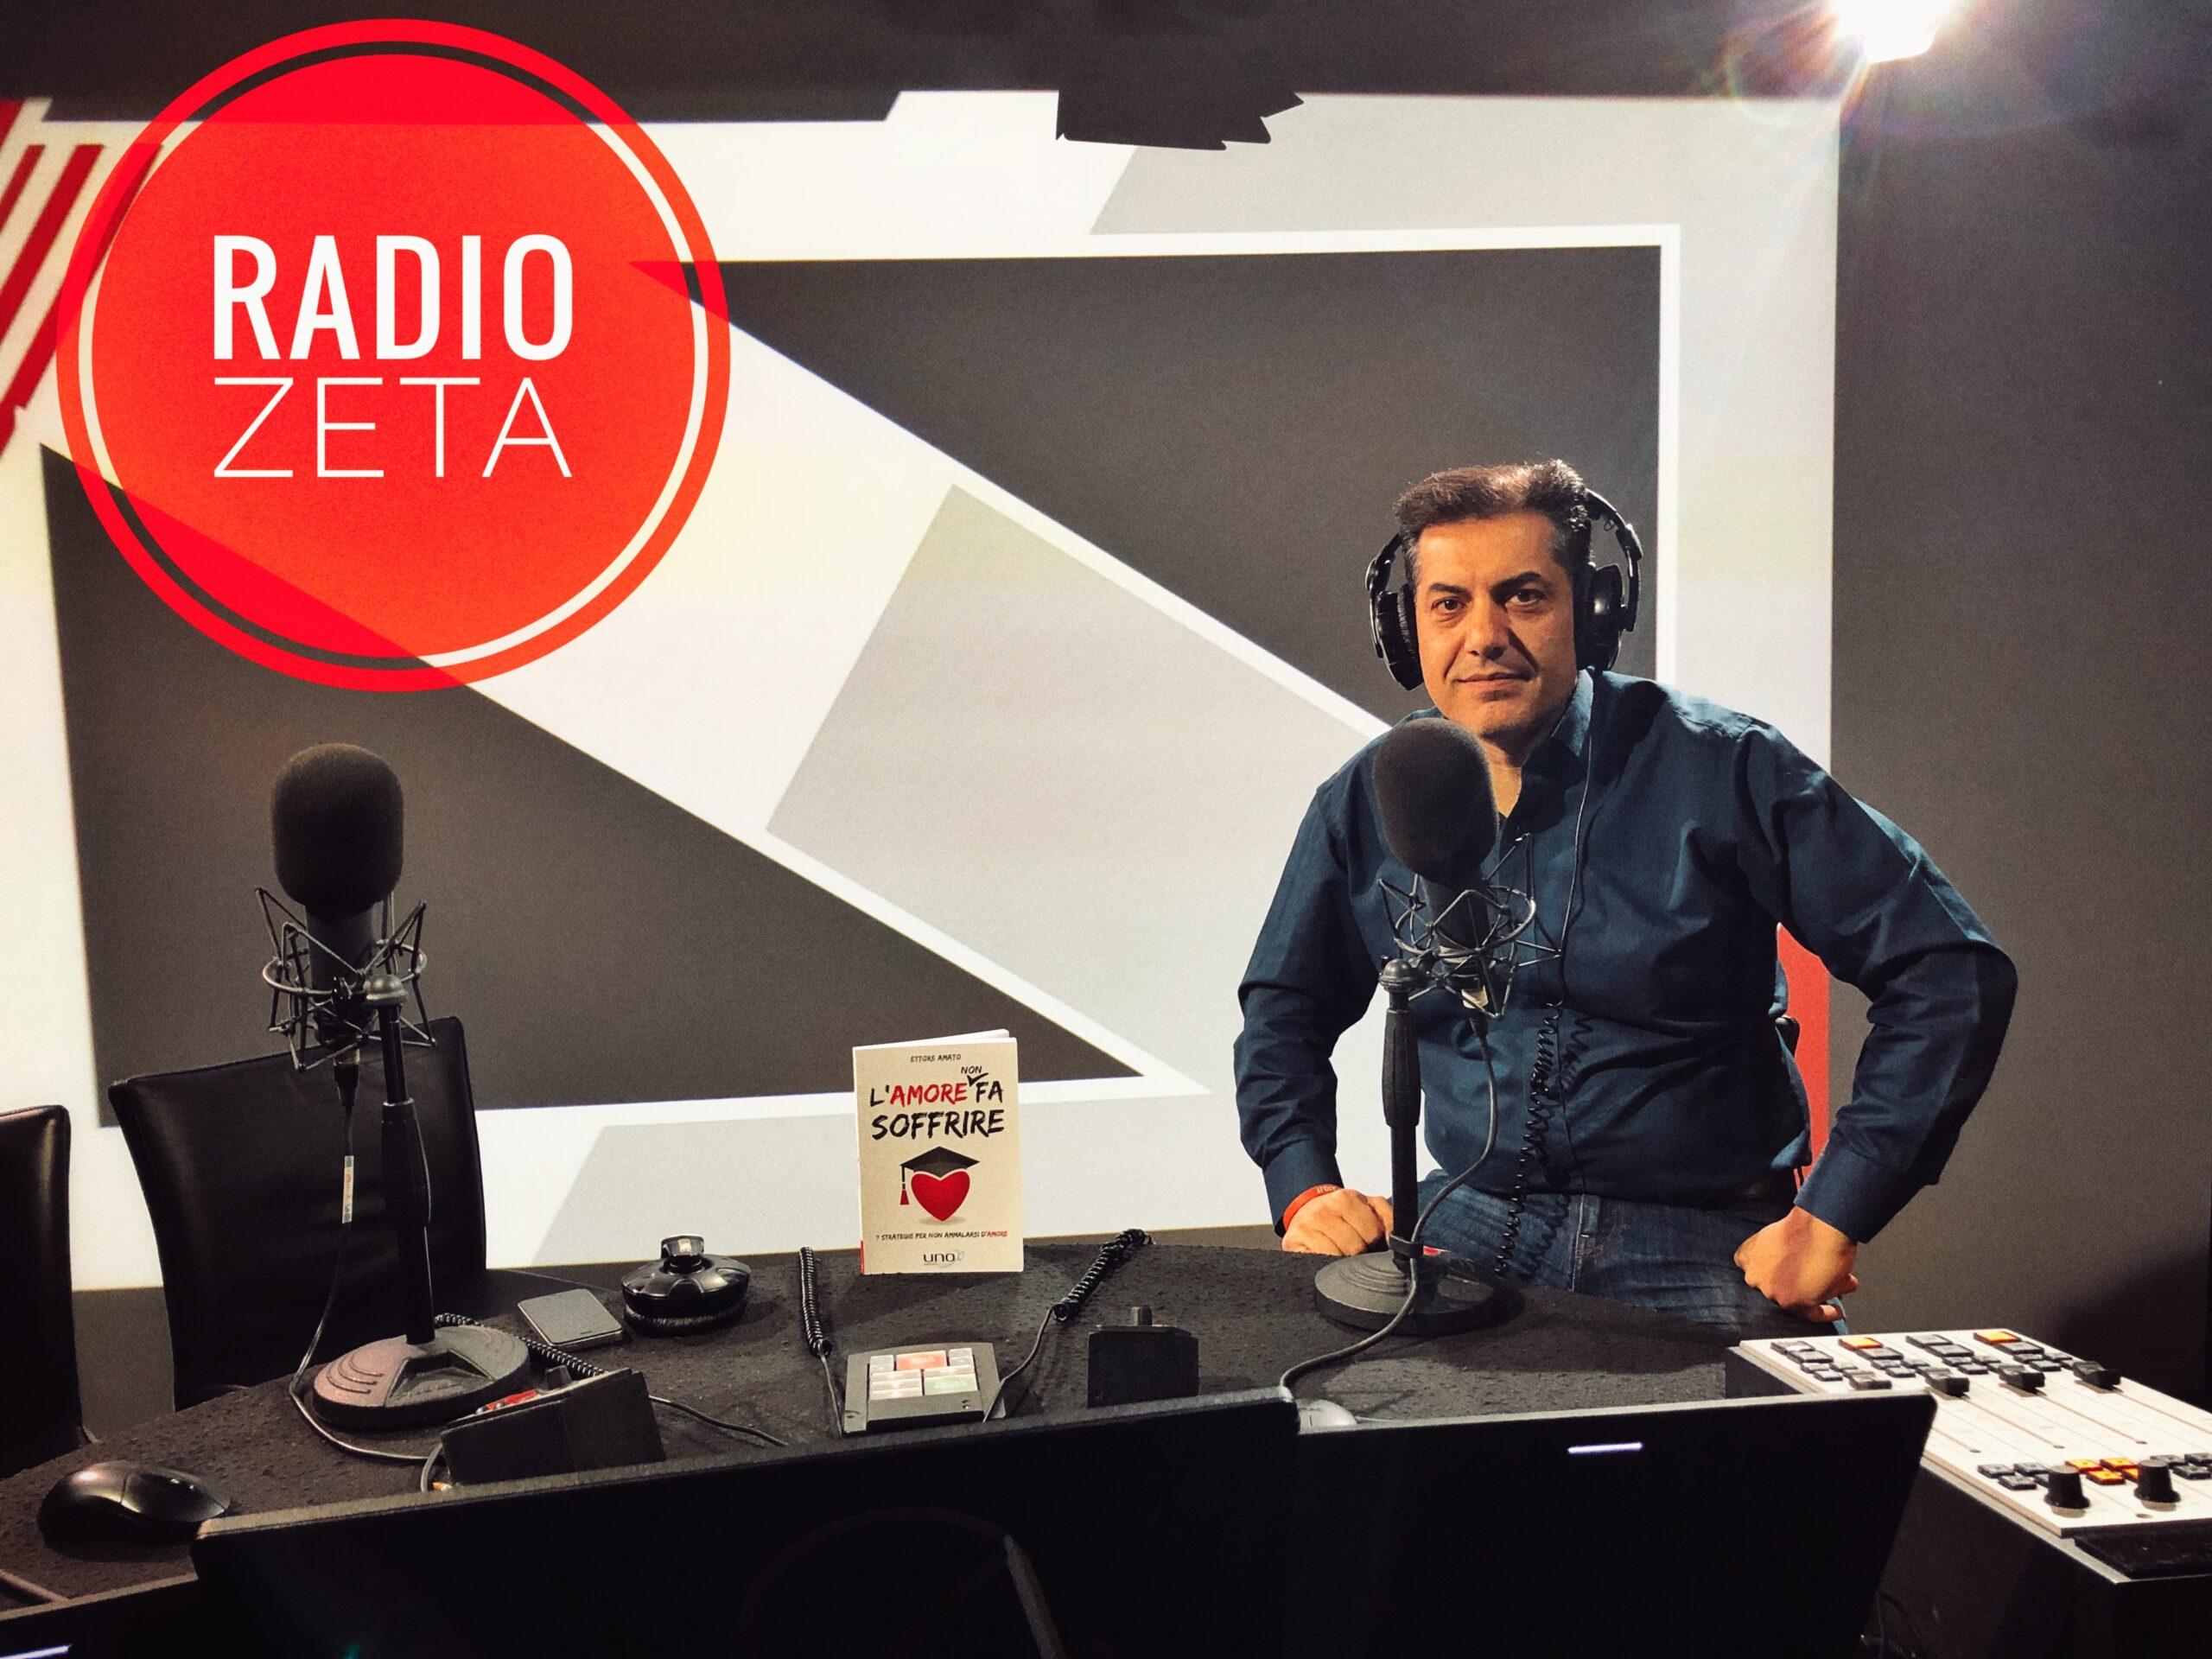 Intervista radio zeta - Ettore Amato